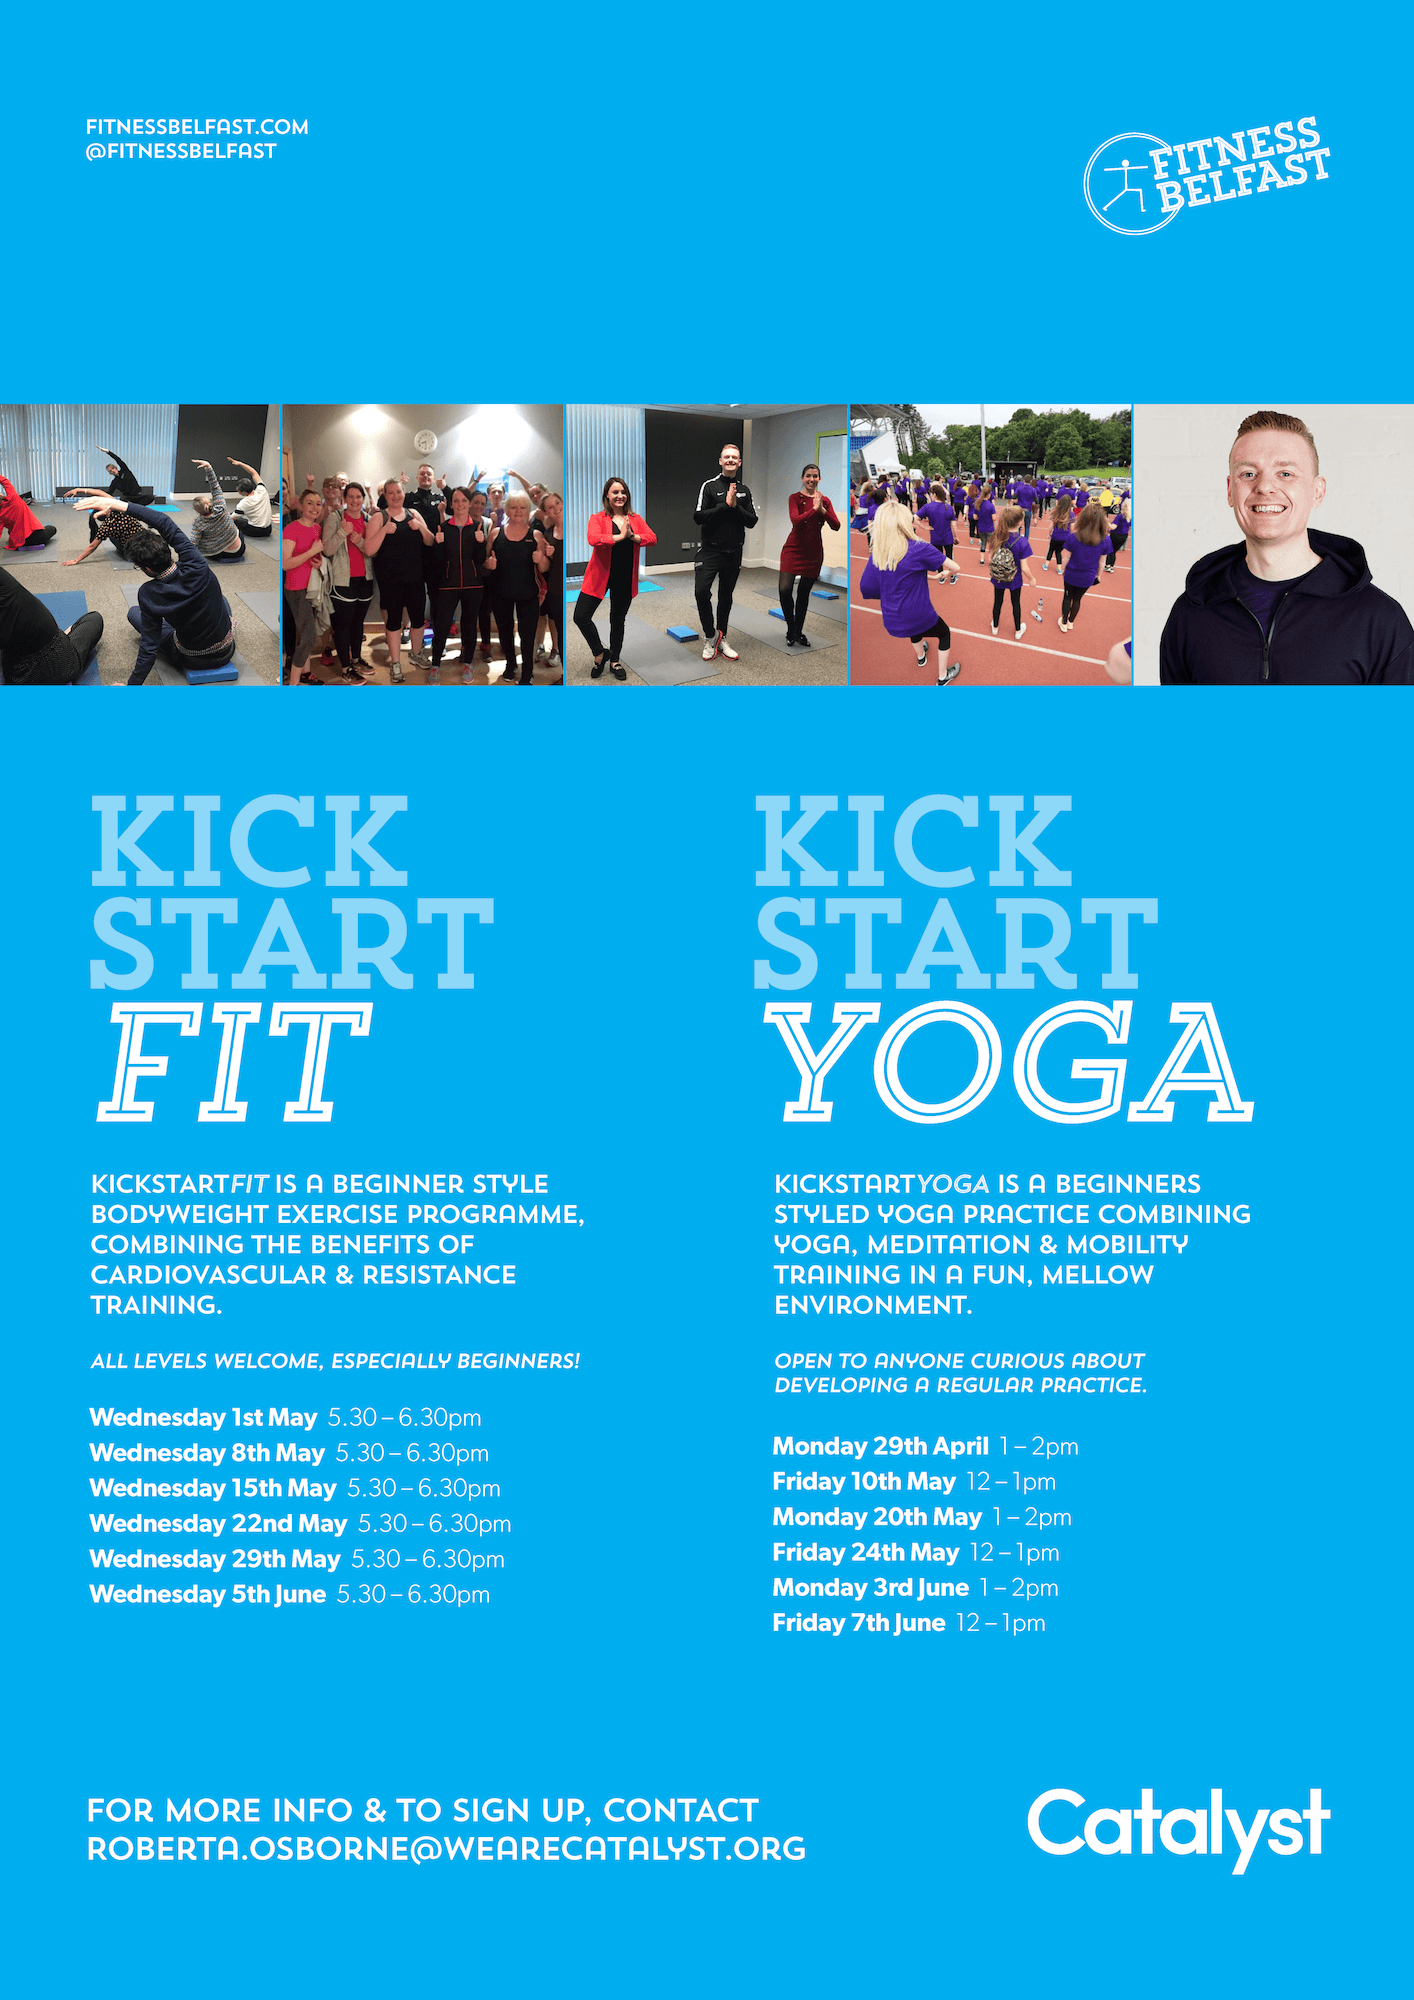 Catalyst + Fitness Belfast Corporate Wellness at Work Kickstart Fit & Yoga Classes.png